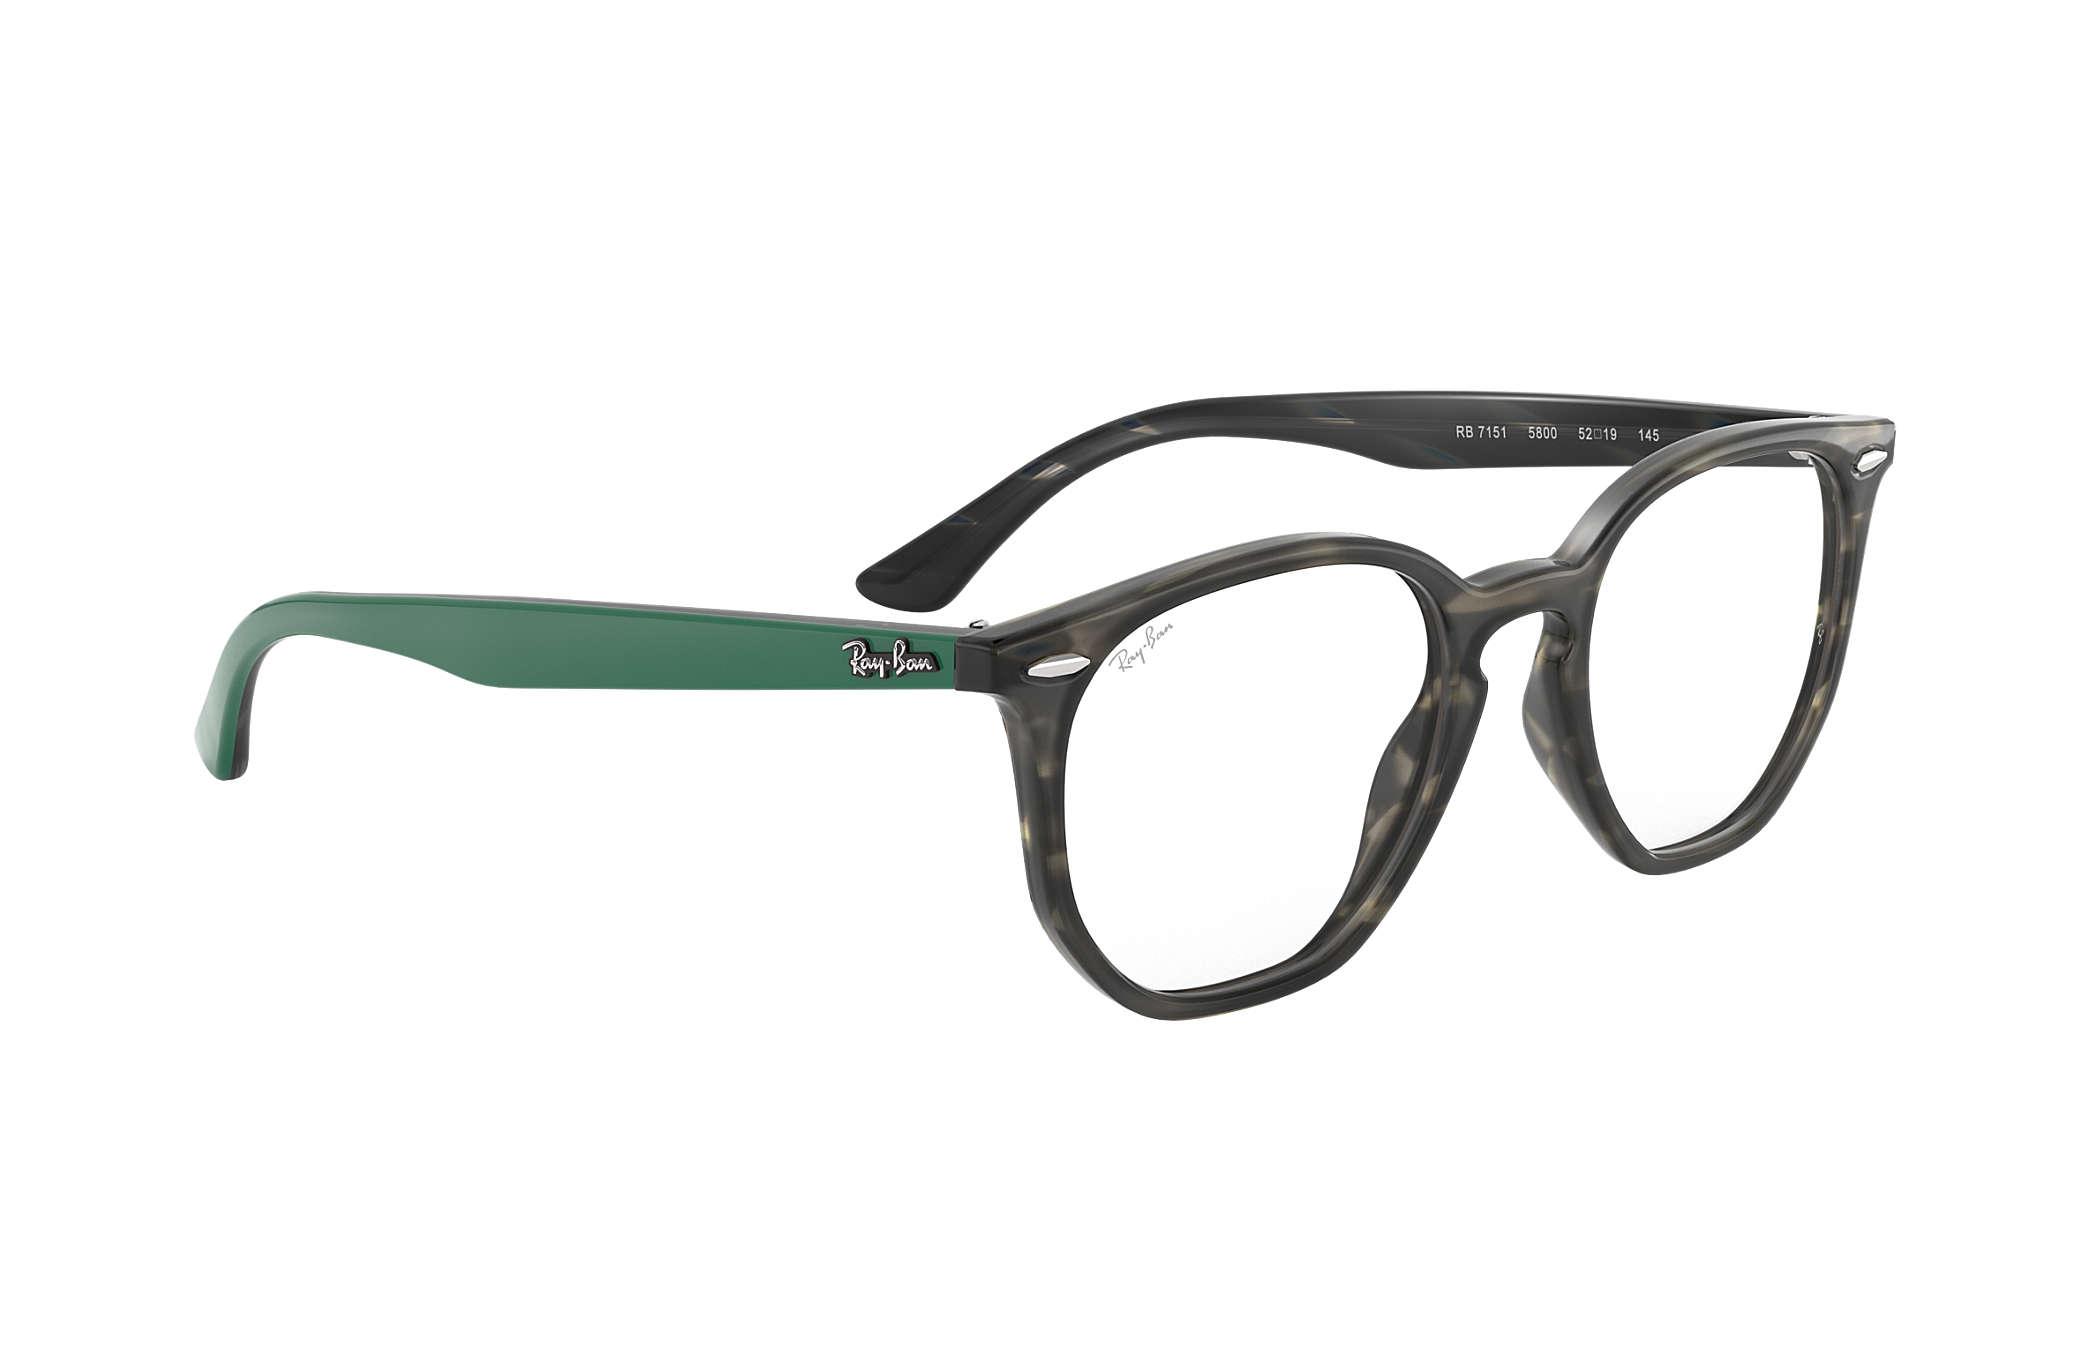 5a1fb6214f4 Ray-Ban prescription glasses Hexagonal Optics RB7151 Tortoise ...